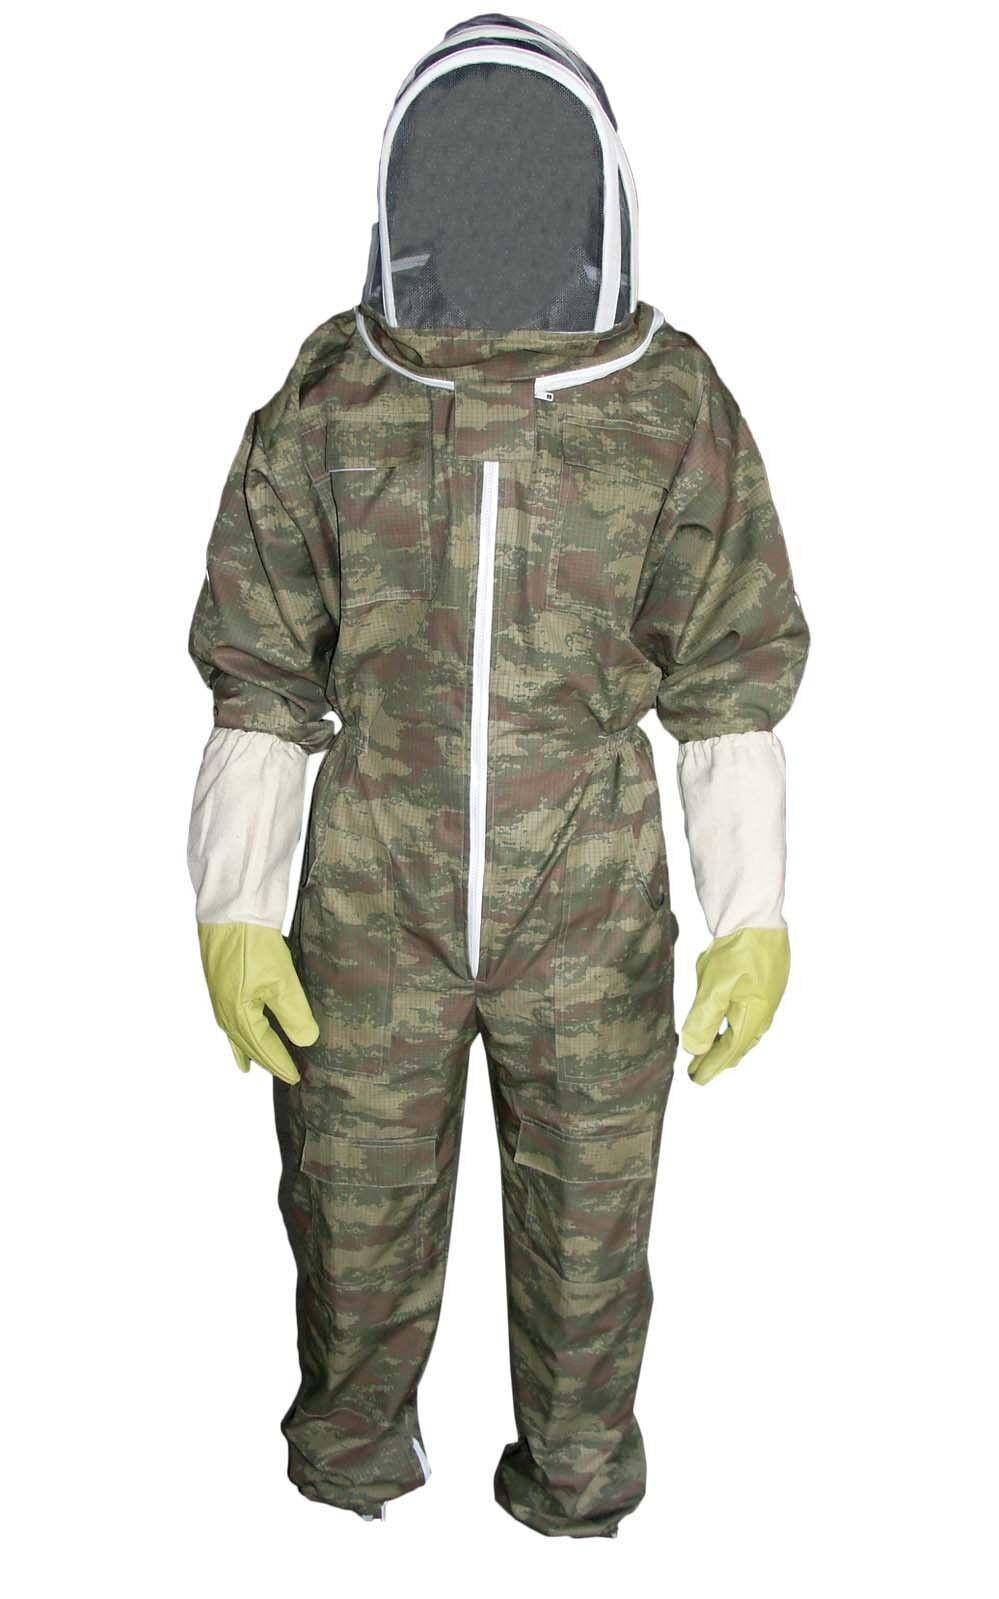 Kids Beekeeping Suit,children Beekeeper Suit, Veil Free Glove Camouflage